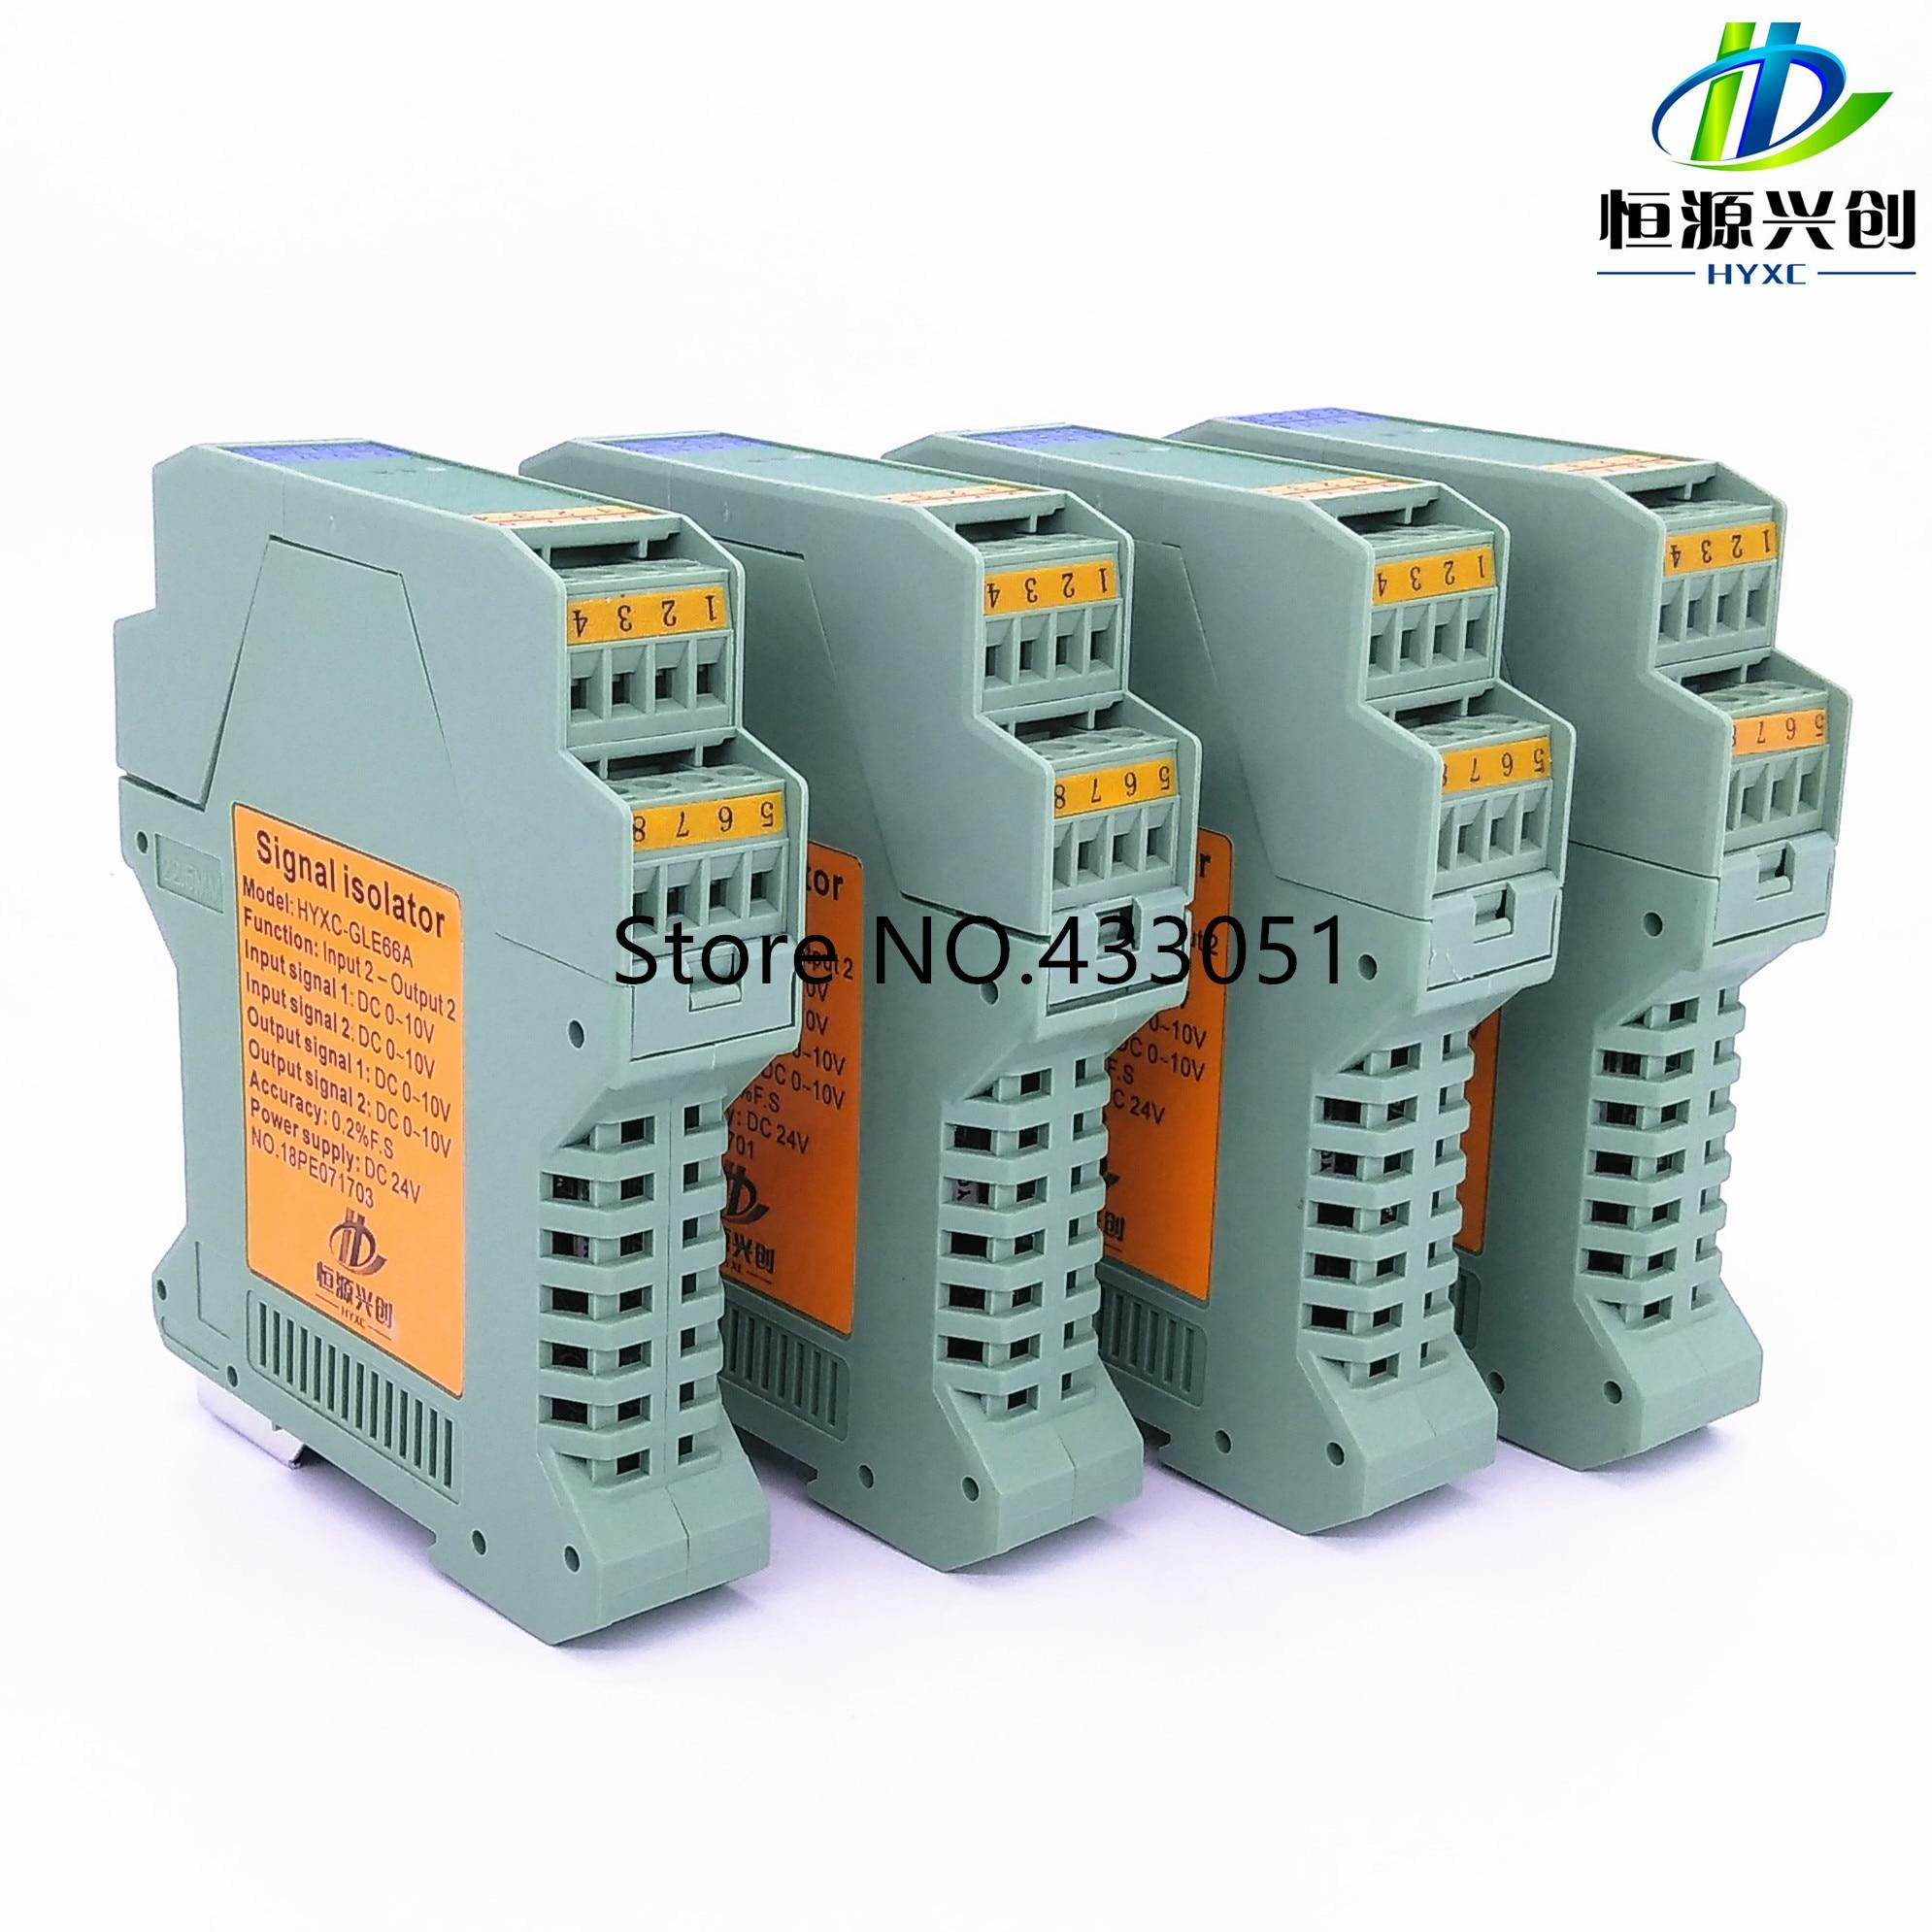 AliExpress - Signal isolation transmitter Current, voltage transmitter Multiple input, multiple output 4-20MA, 0-5V, 0-10V